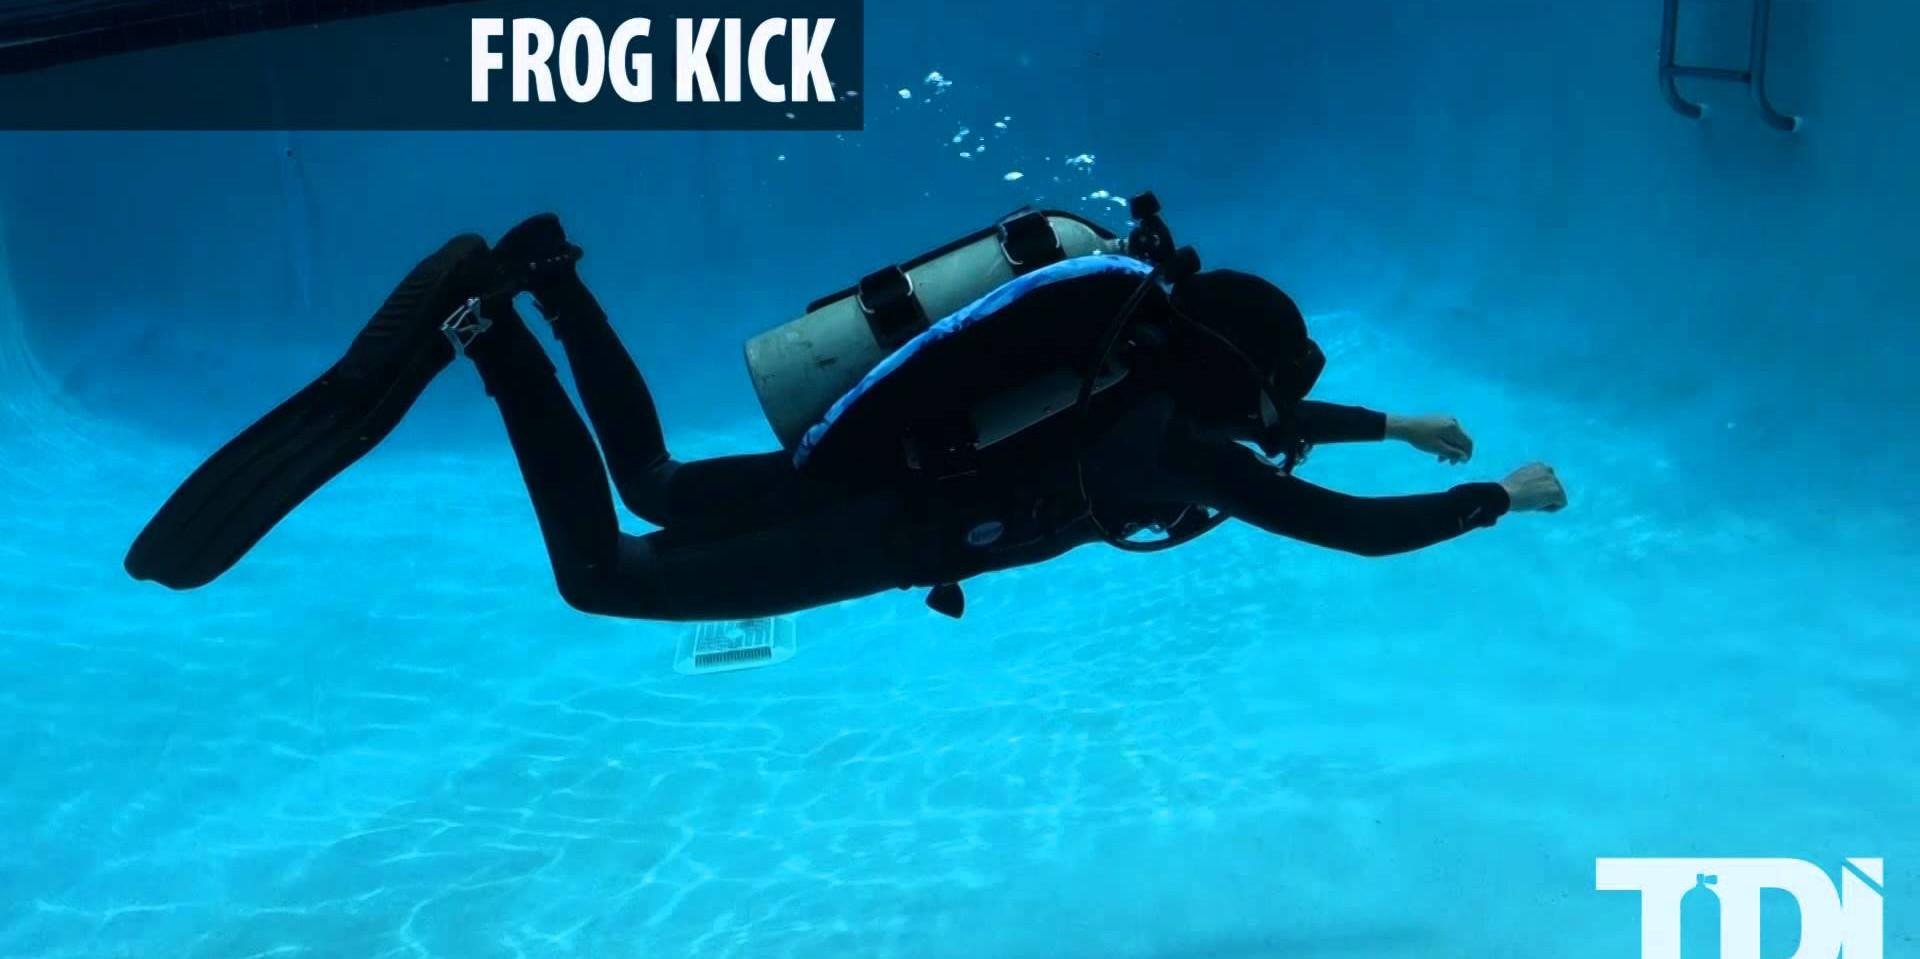 SDI/TDI Scuba Diving Finning Techniques - Frog Kick